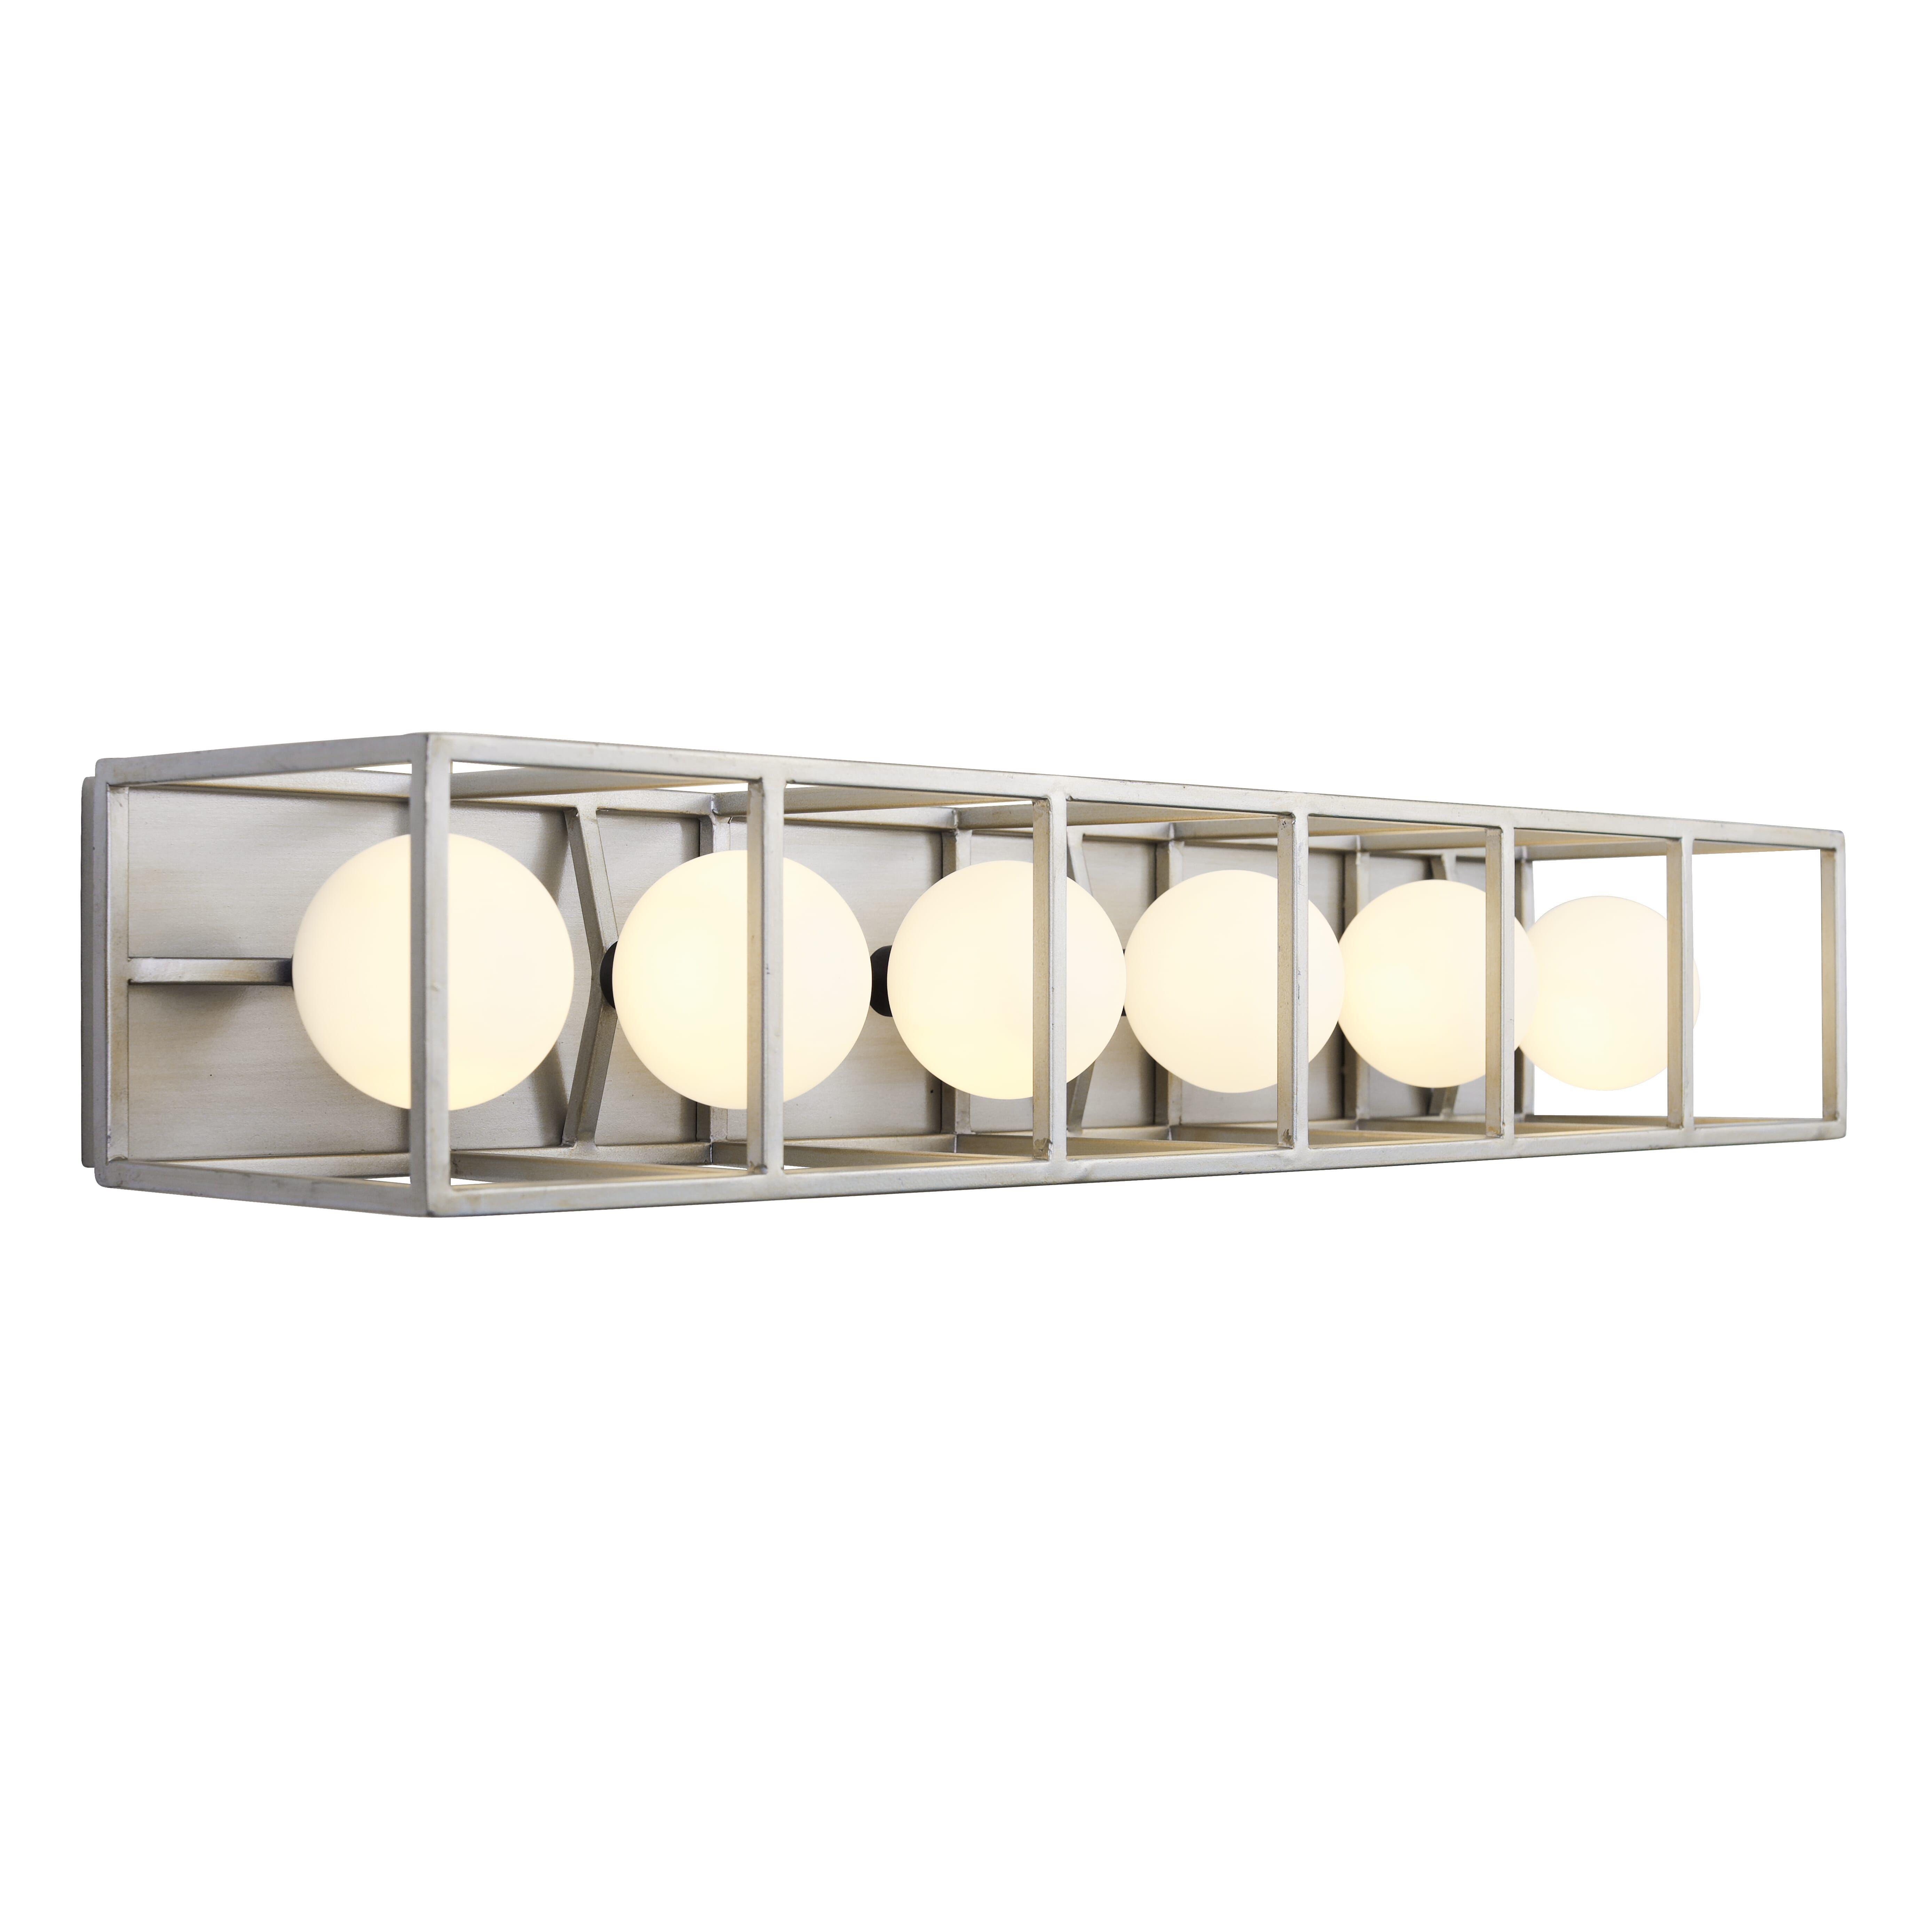 Photo of Varaluz Plaza 6-Light 5″ Bathroom Vanity Light in Silverado with Carbon